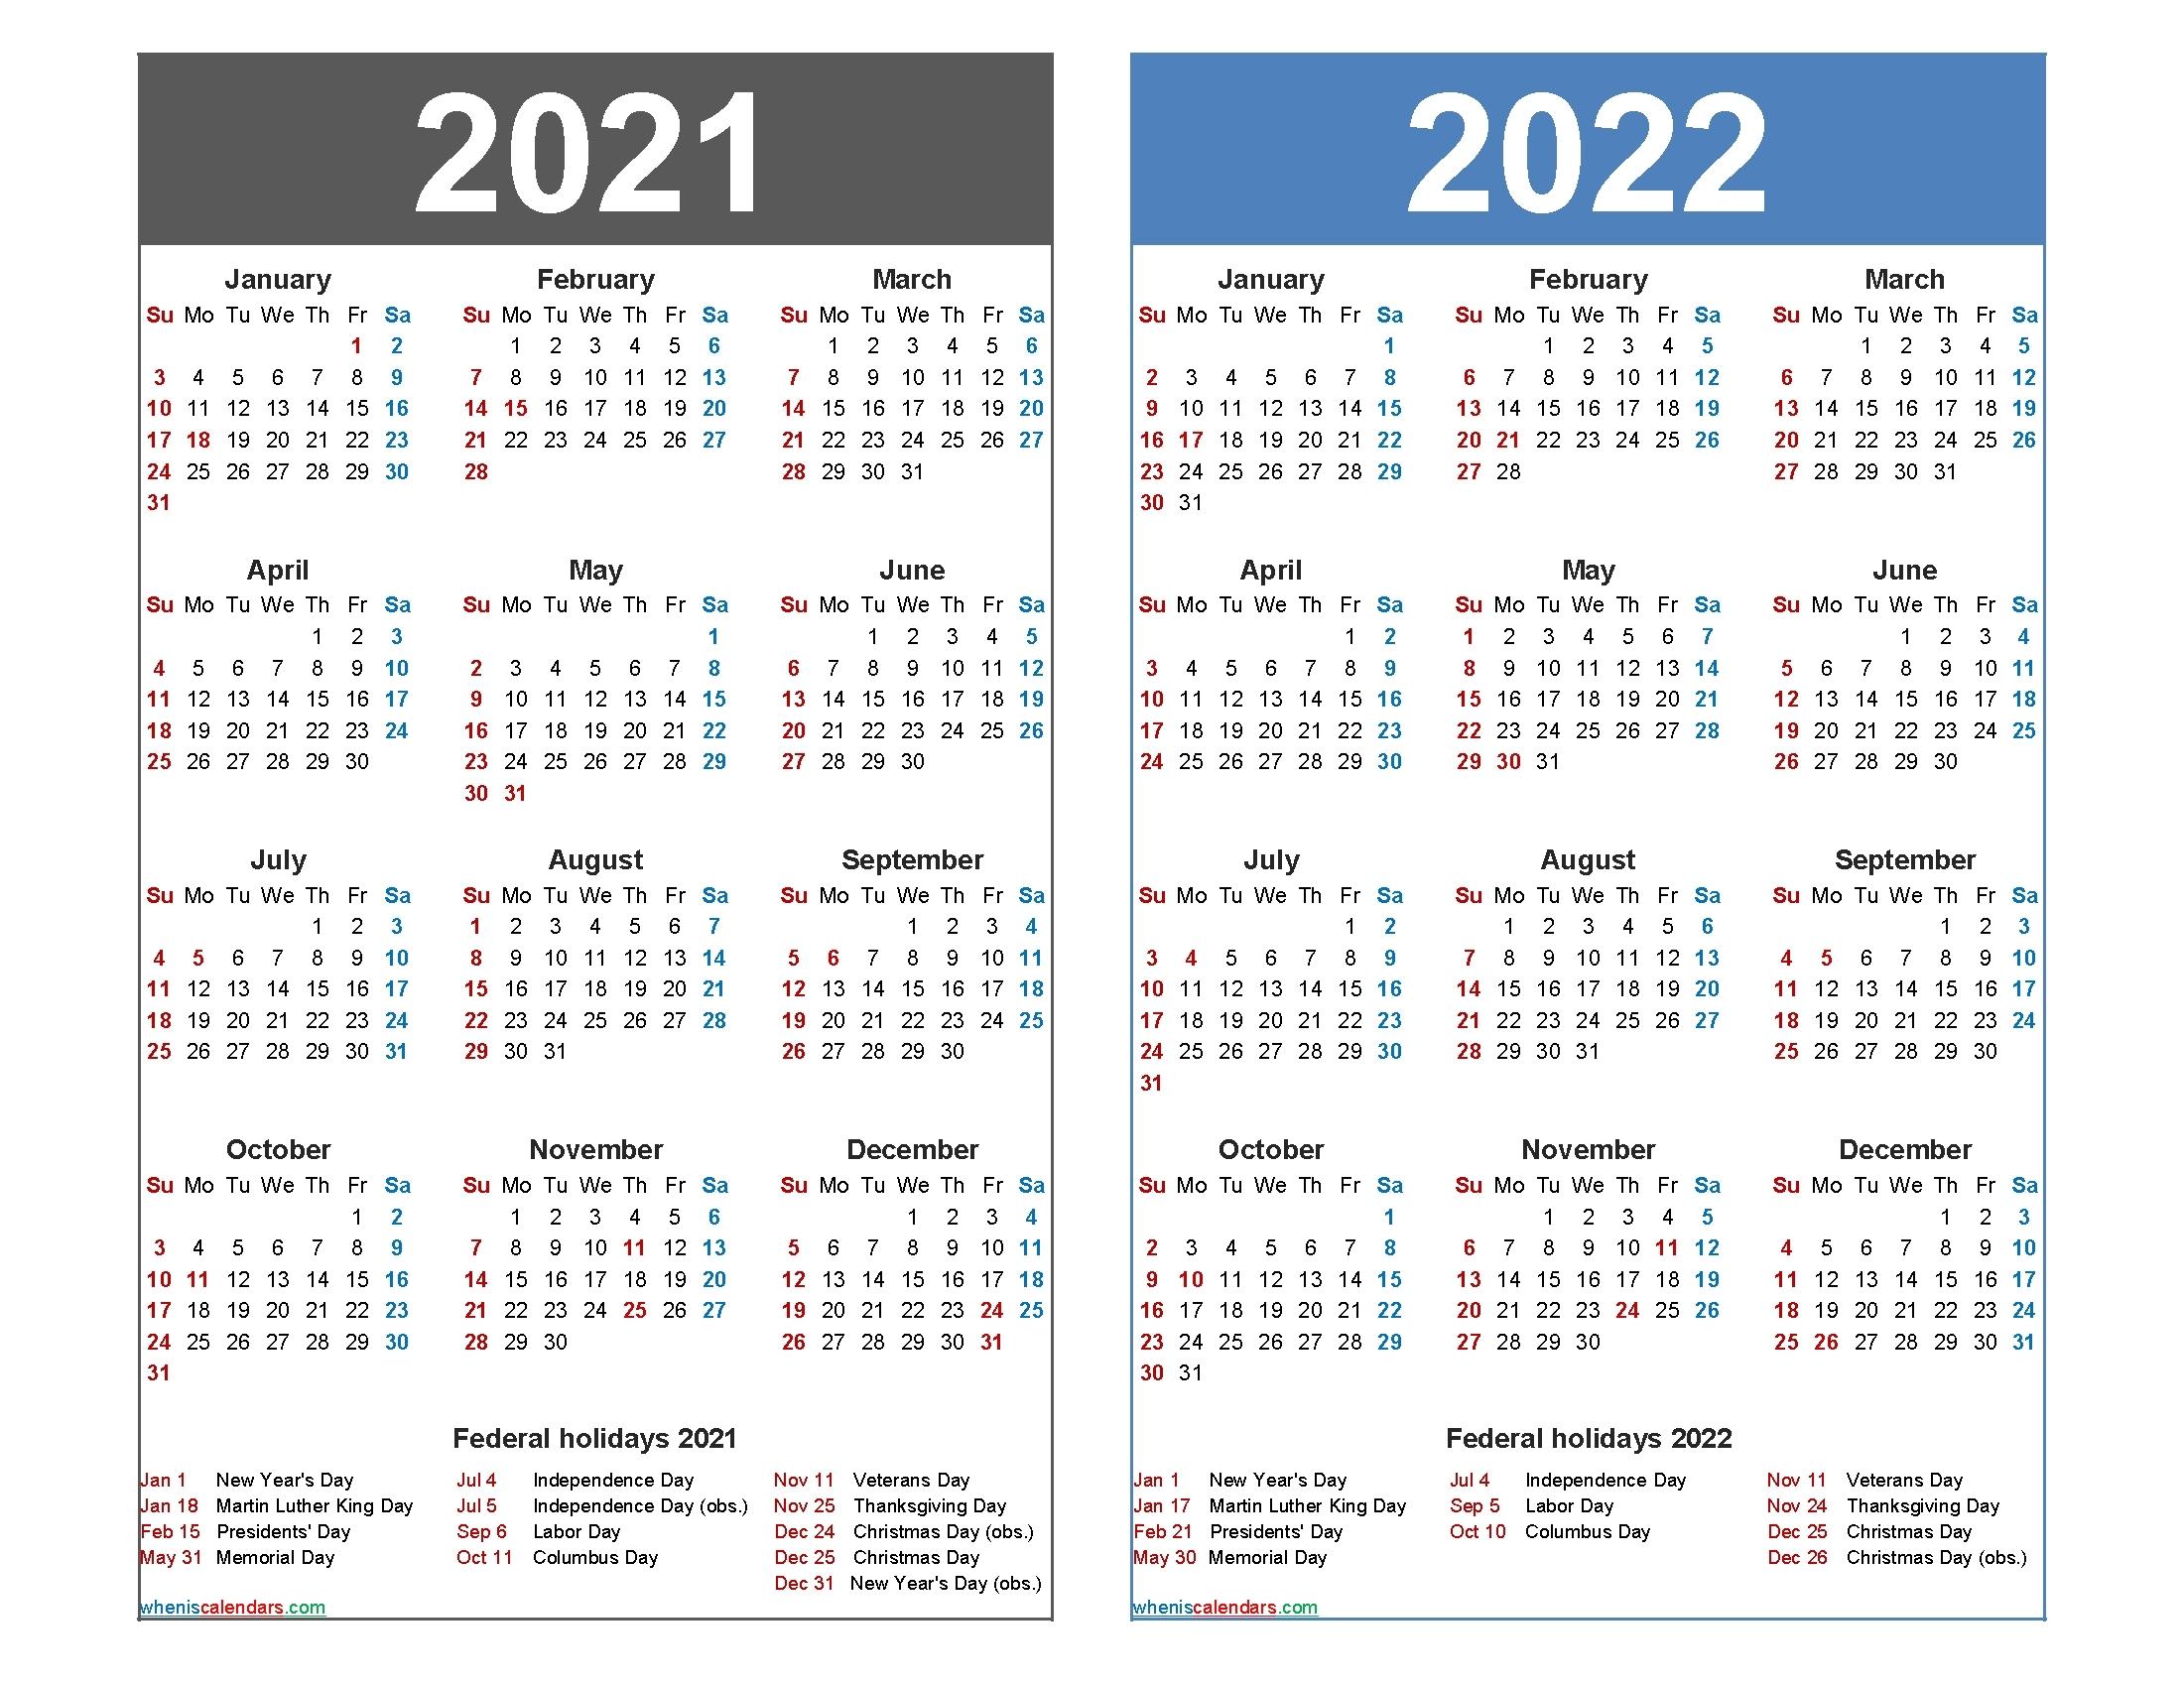 federal holidays 2021 calendar example calendar printable::Downloadable 2021 Calendar with Holidays